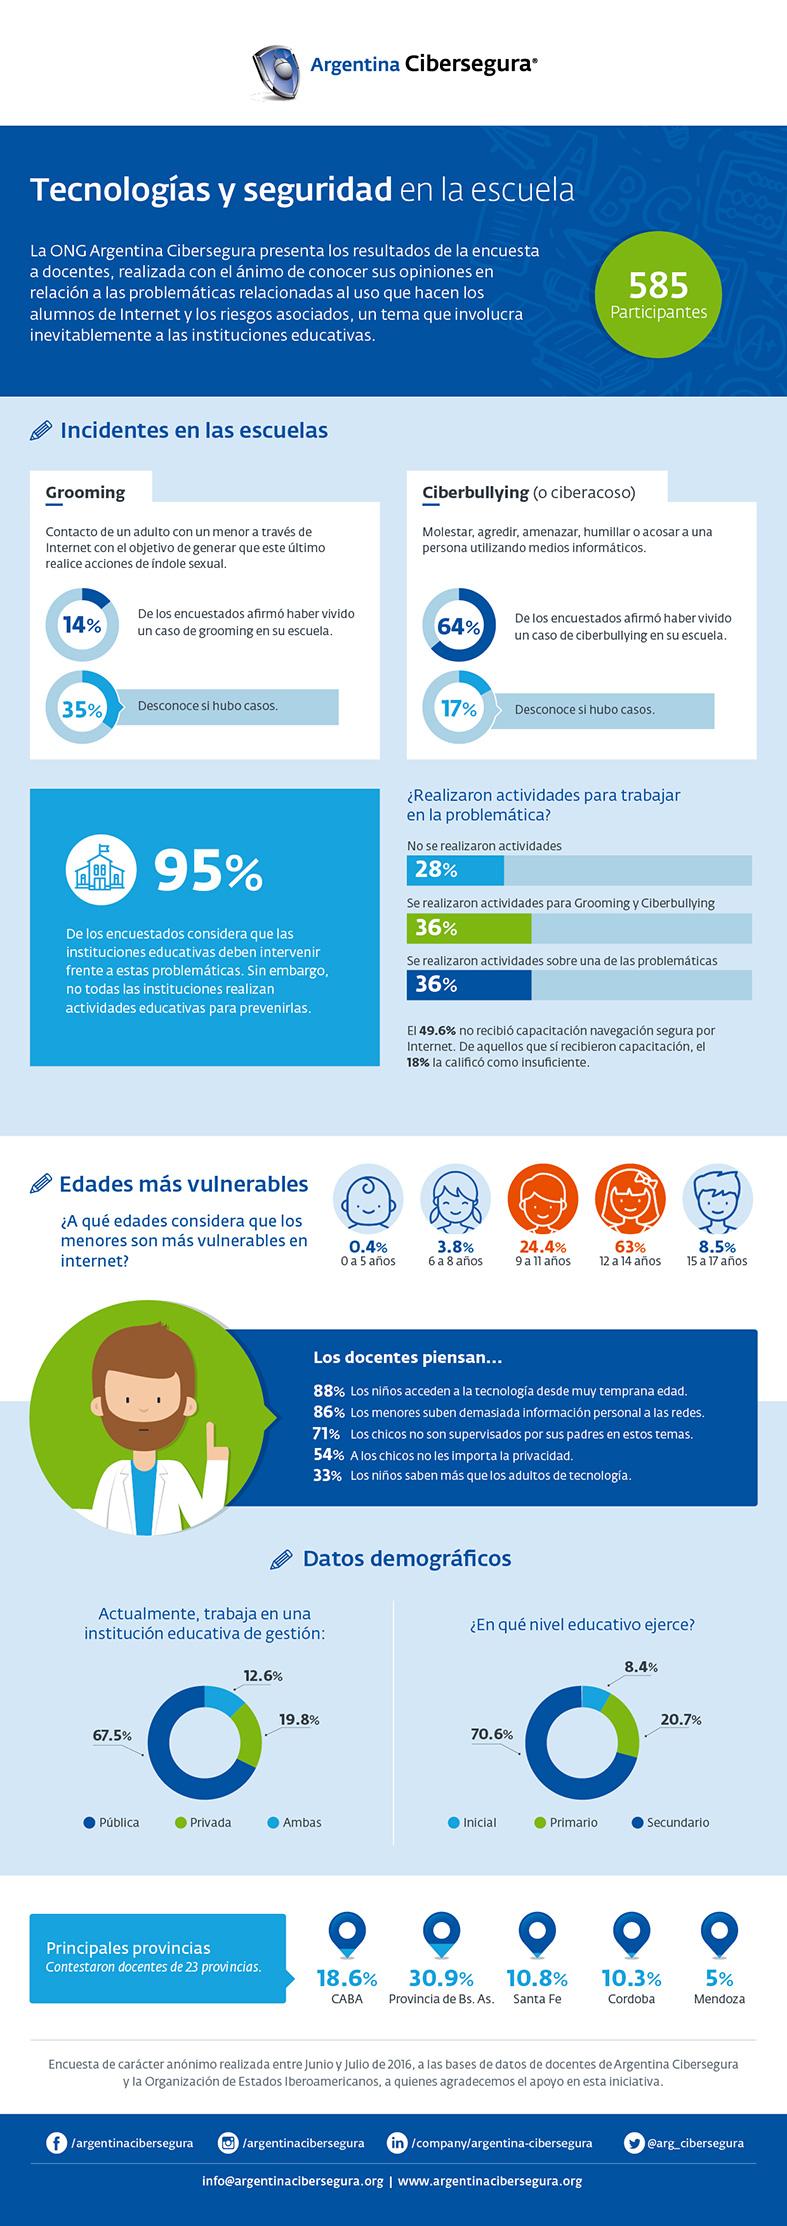 argentina-cibersegura-infografia-encuesta-docente